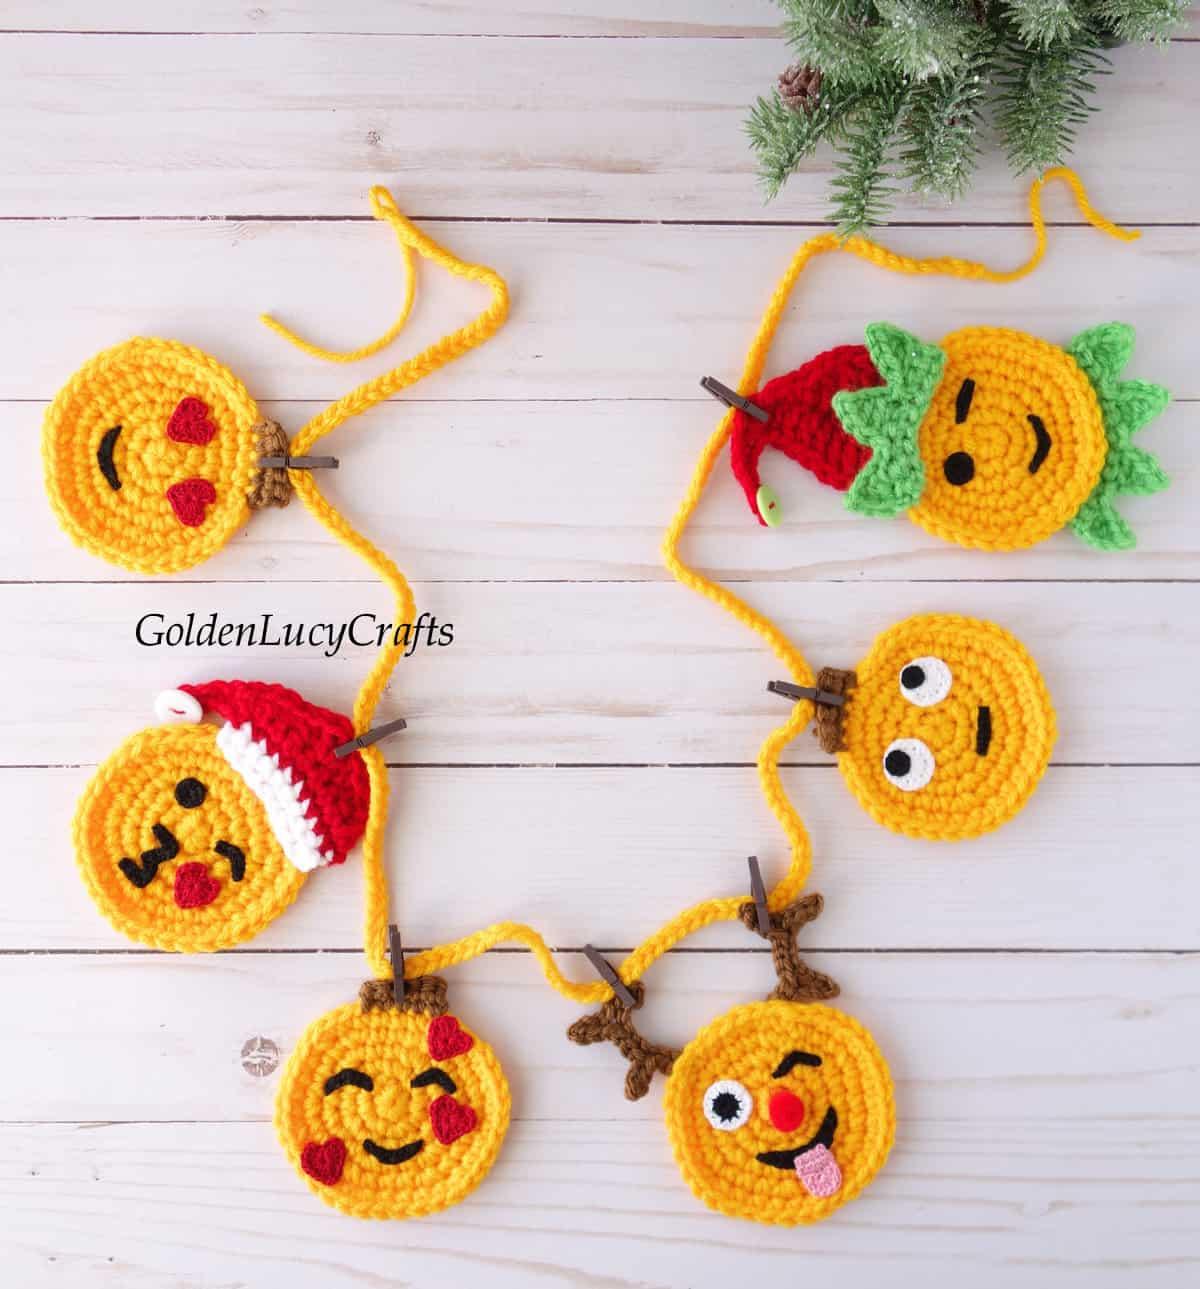 Crochet Christmas emoji garland.